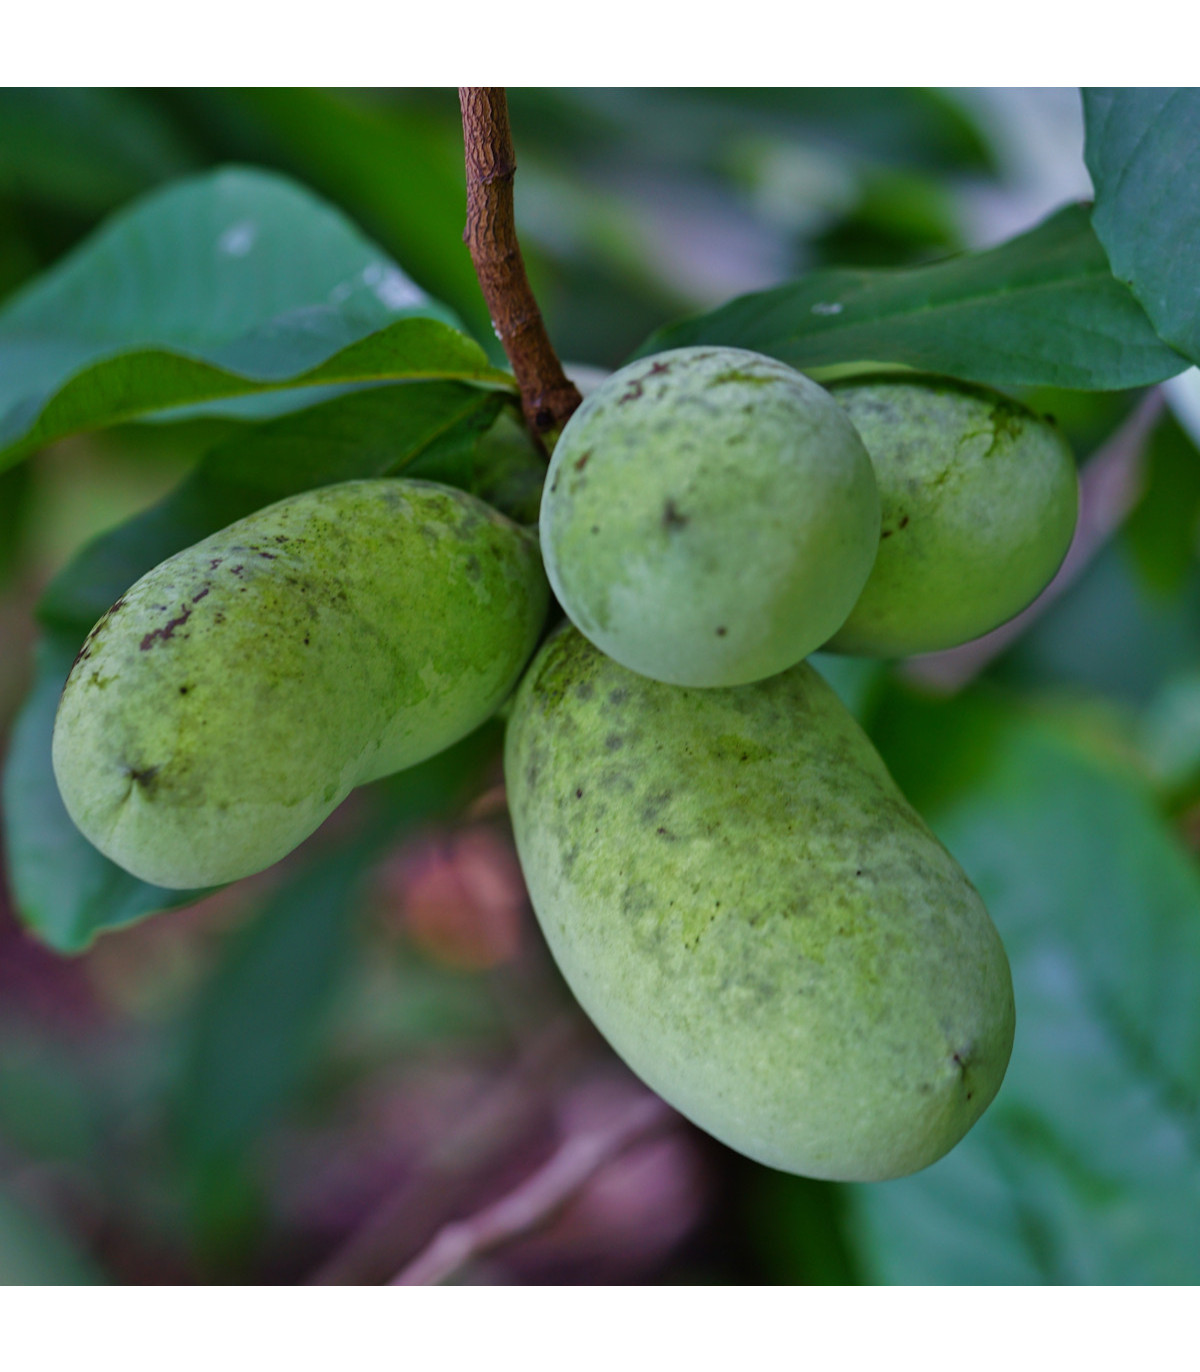 Paw Paw - Moďoul trojlaločný - Indiánský banán - Asimina triloba - osivo paw paw - 4 ks